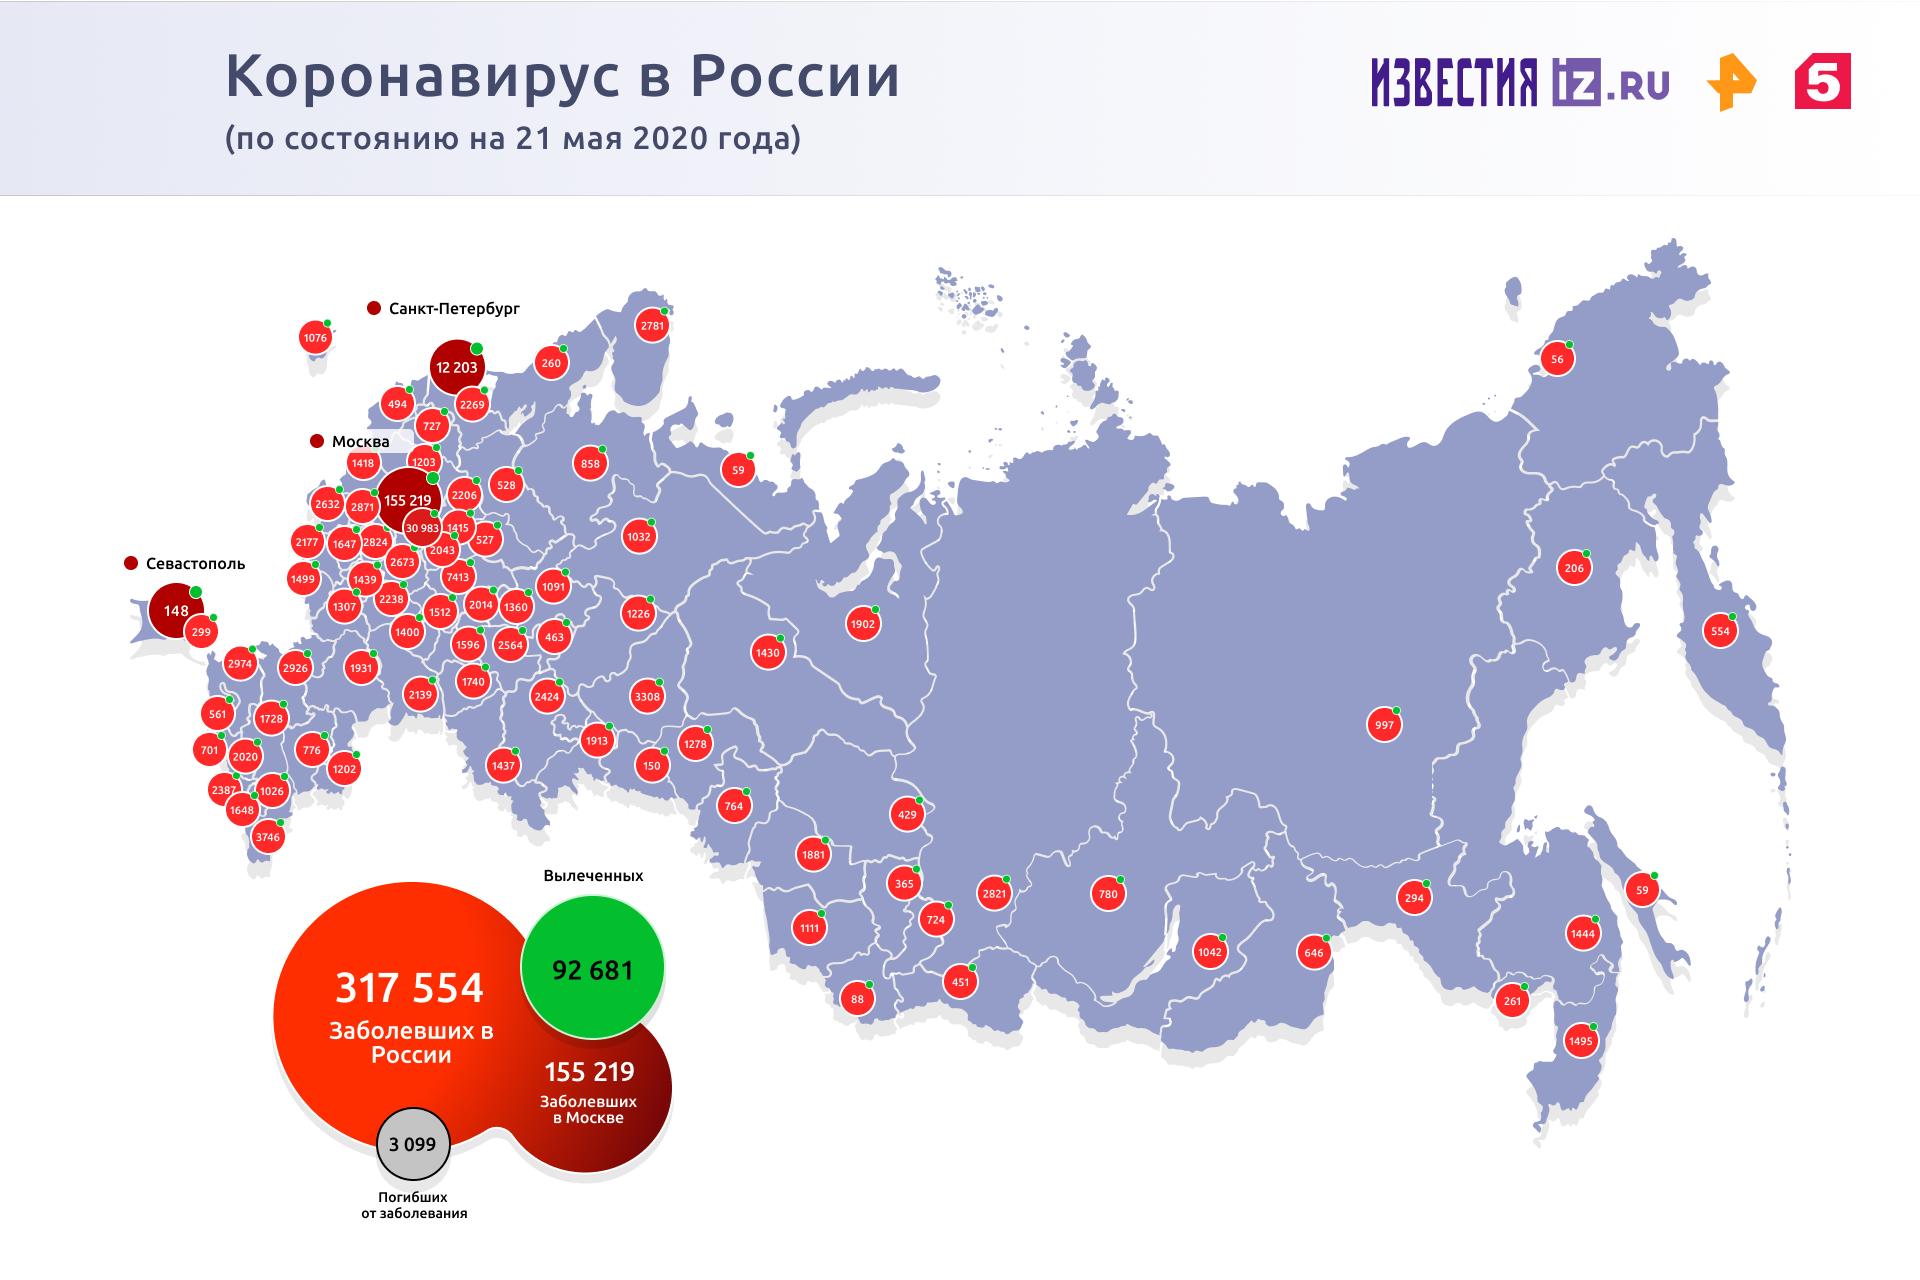 Мясников объяснил причину «русского чуда» во время коронавируса